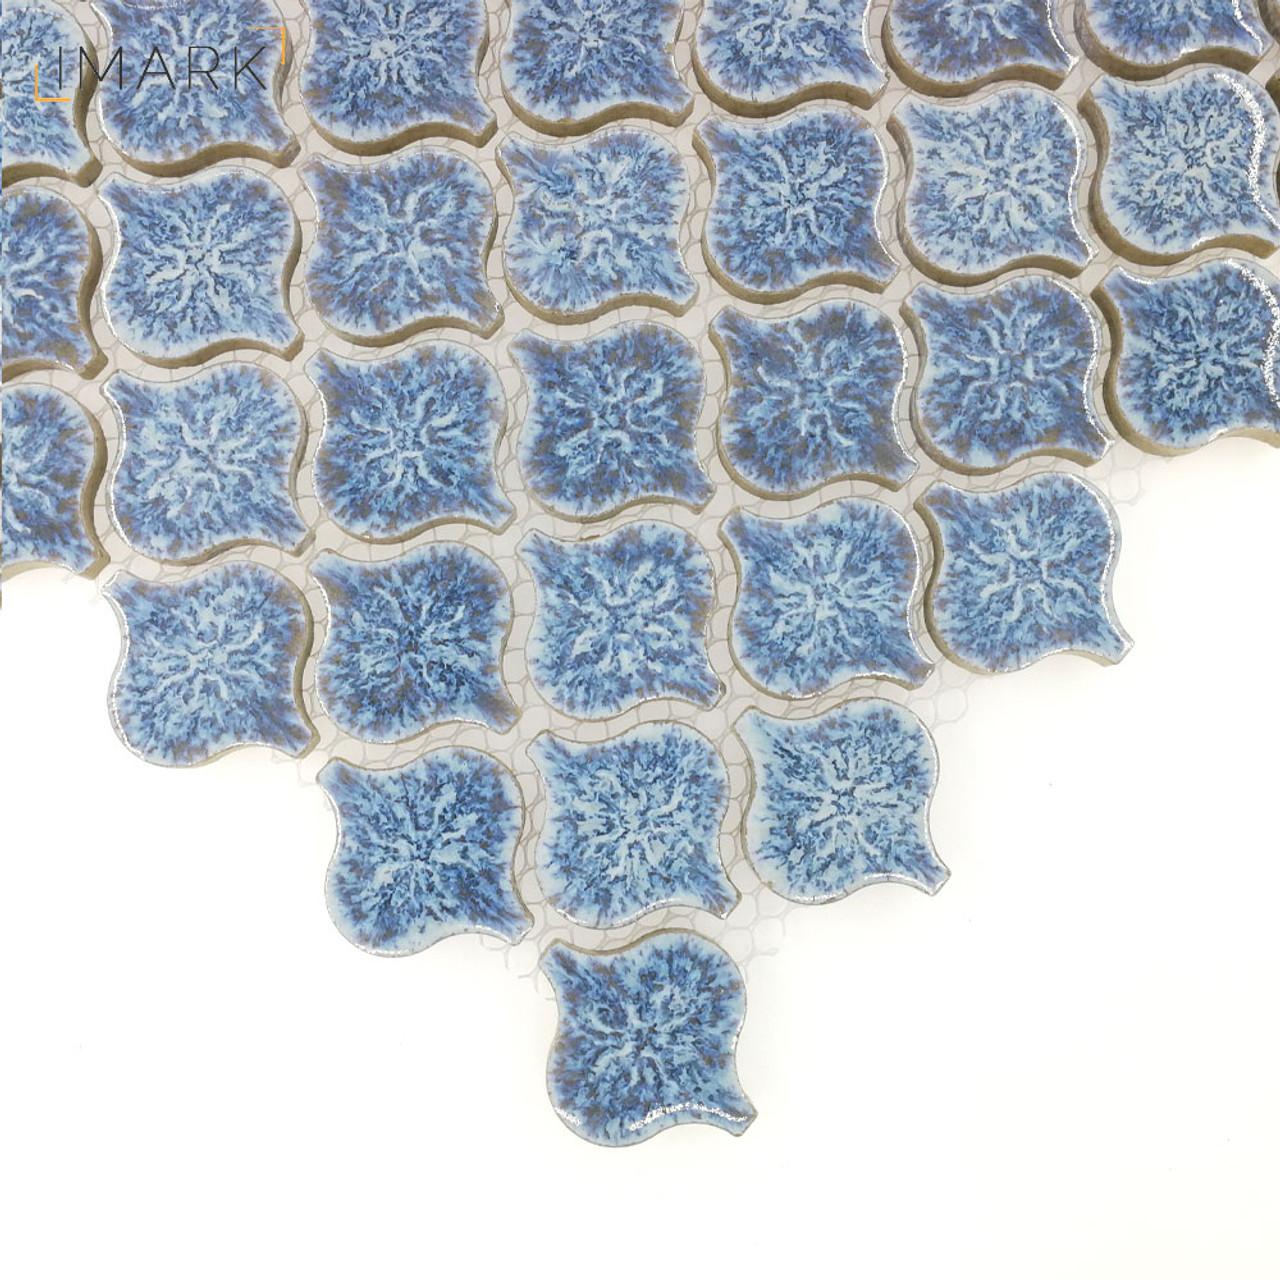 Lantern Mini Cobalt Blue Ceramic Mosaic Tile For Backsplash Tile ...